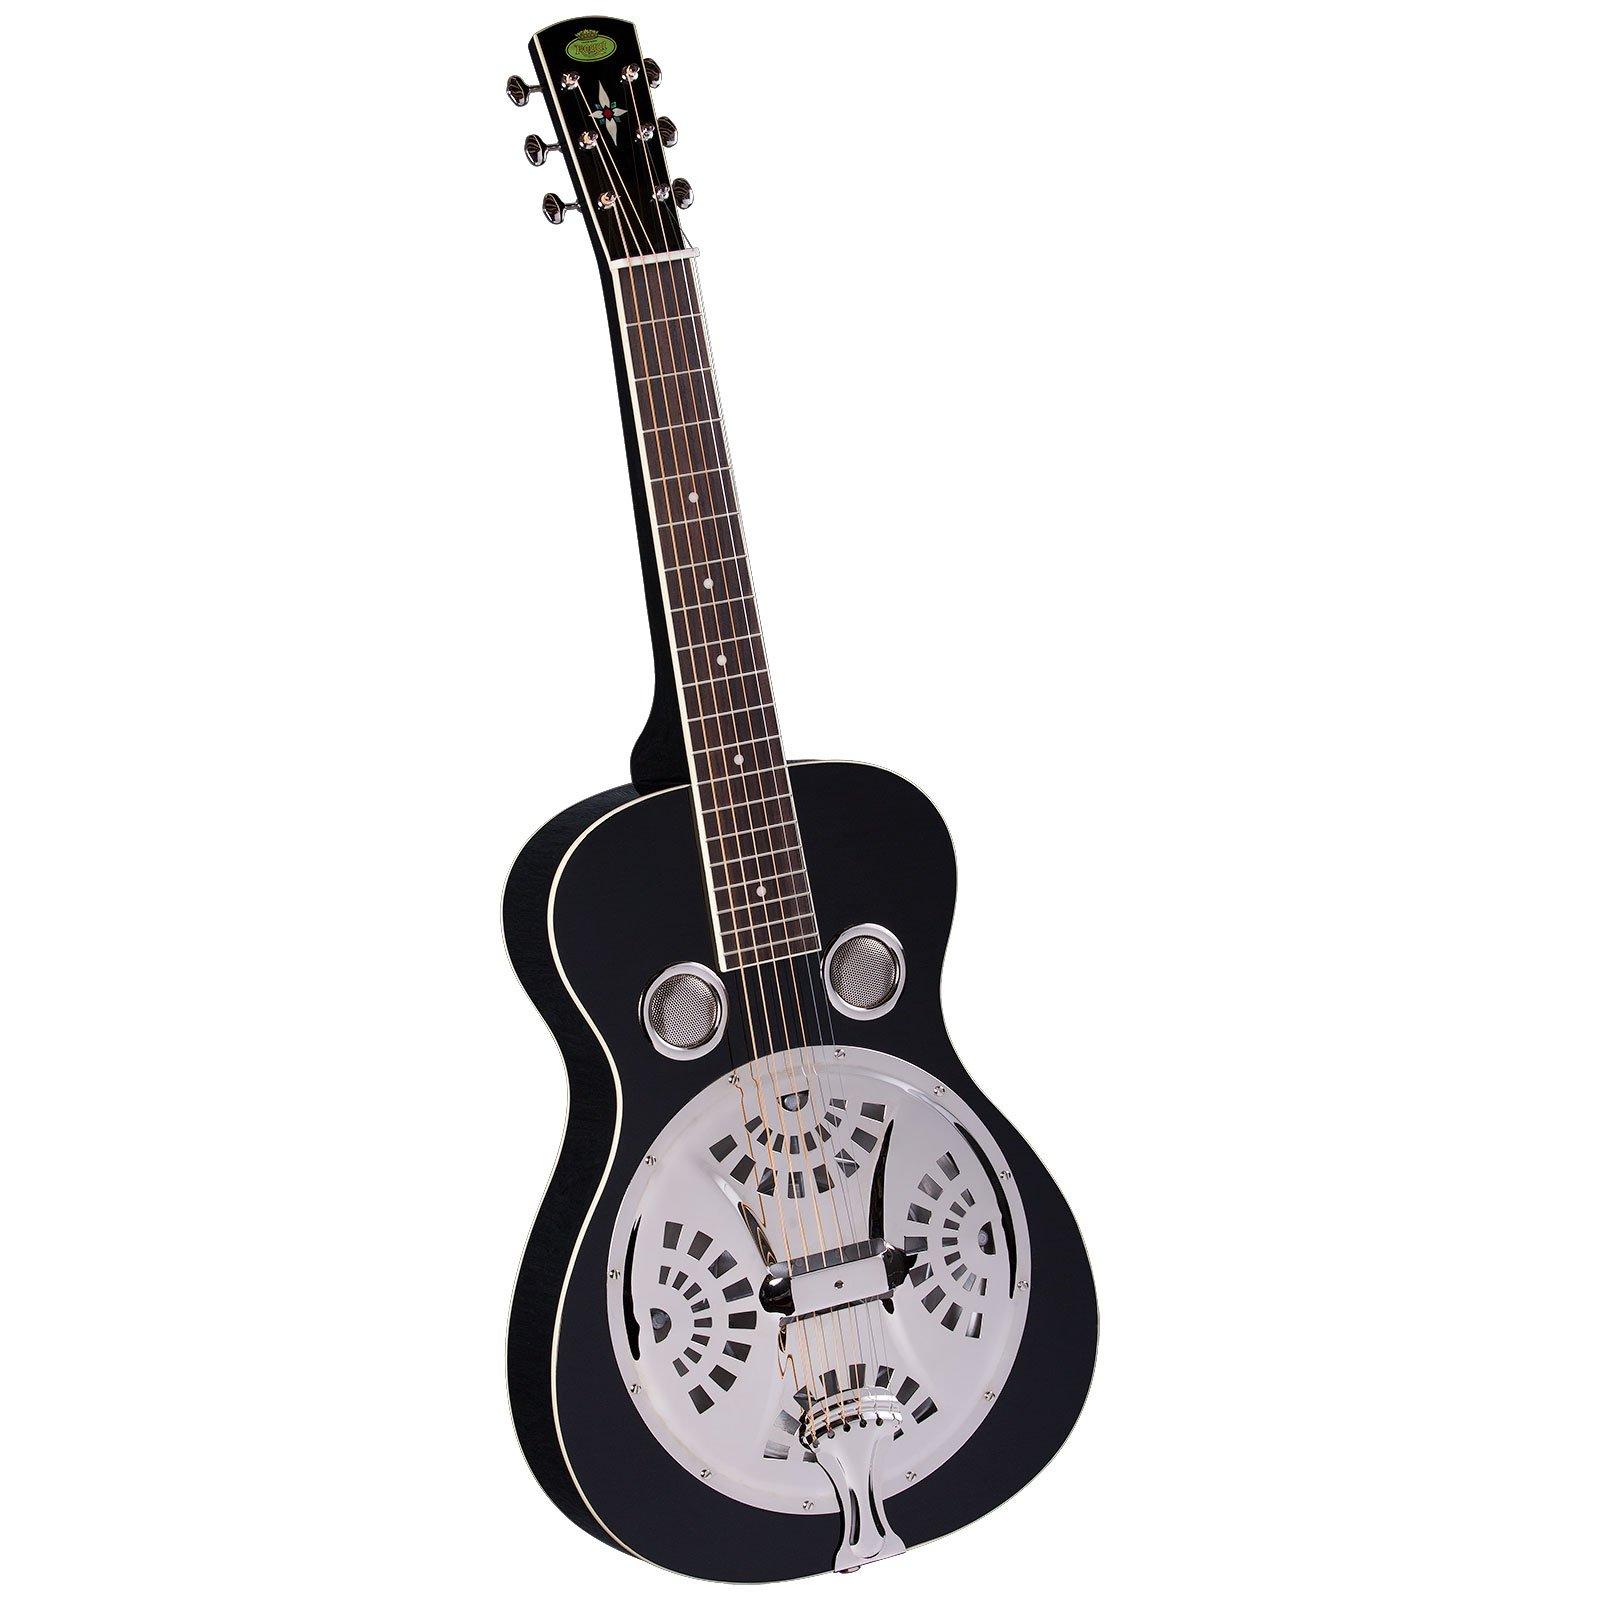 Regal RD-40BS Studio Series Squareneck Resophonic Guitar - Black by Regal Resophonic Guitars